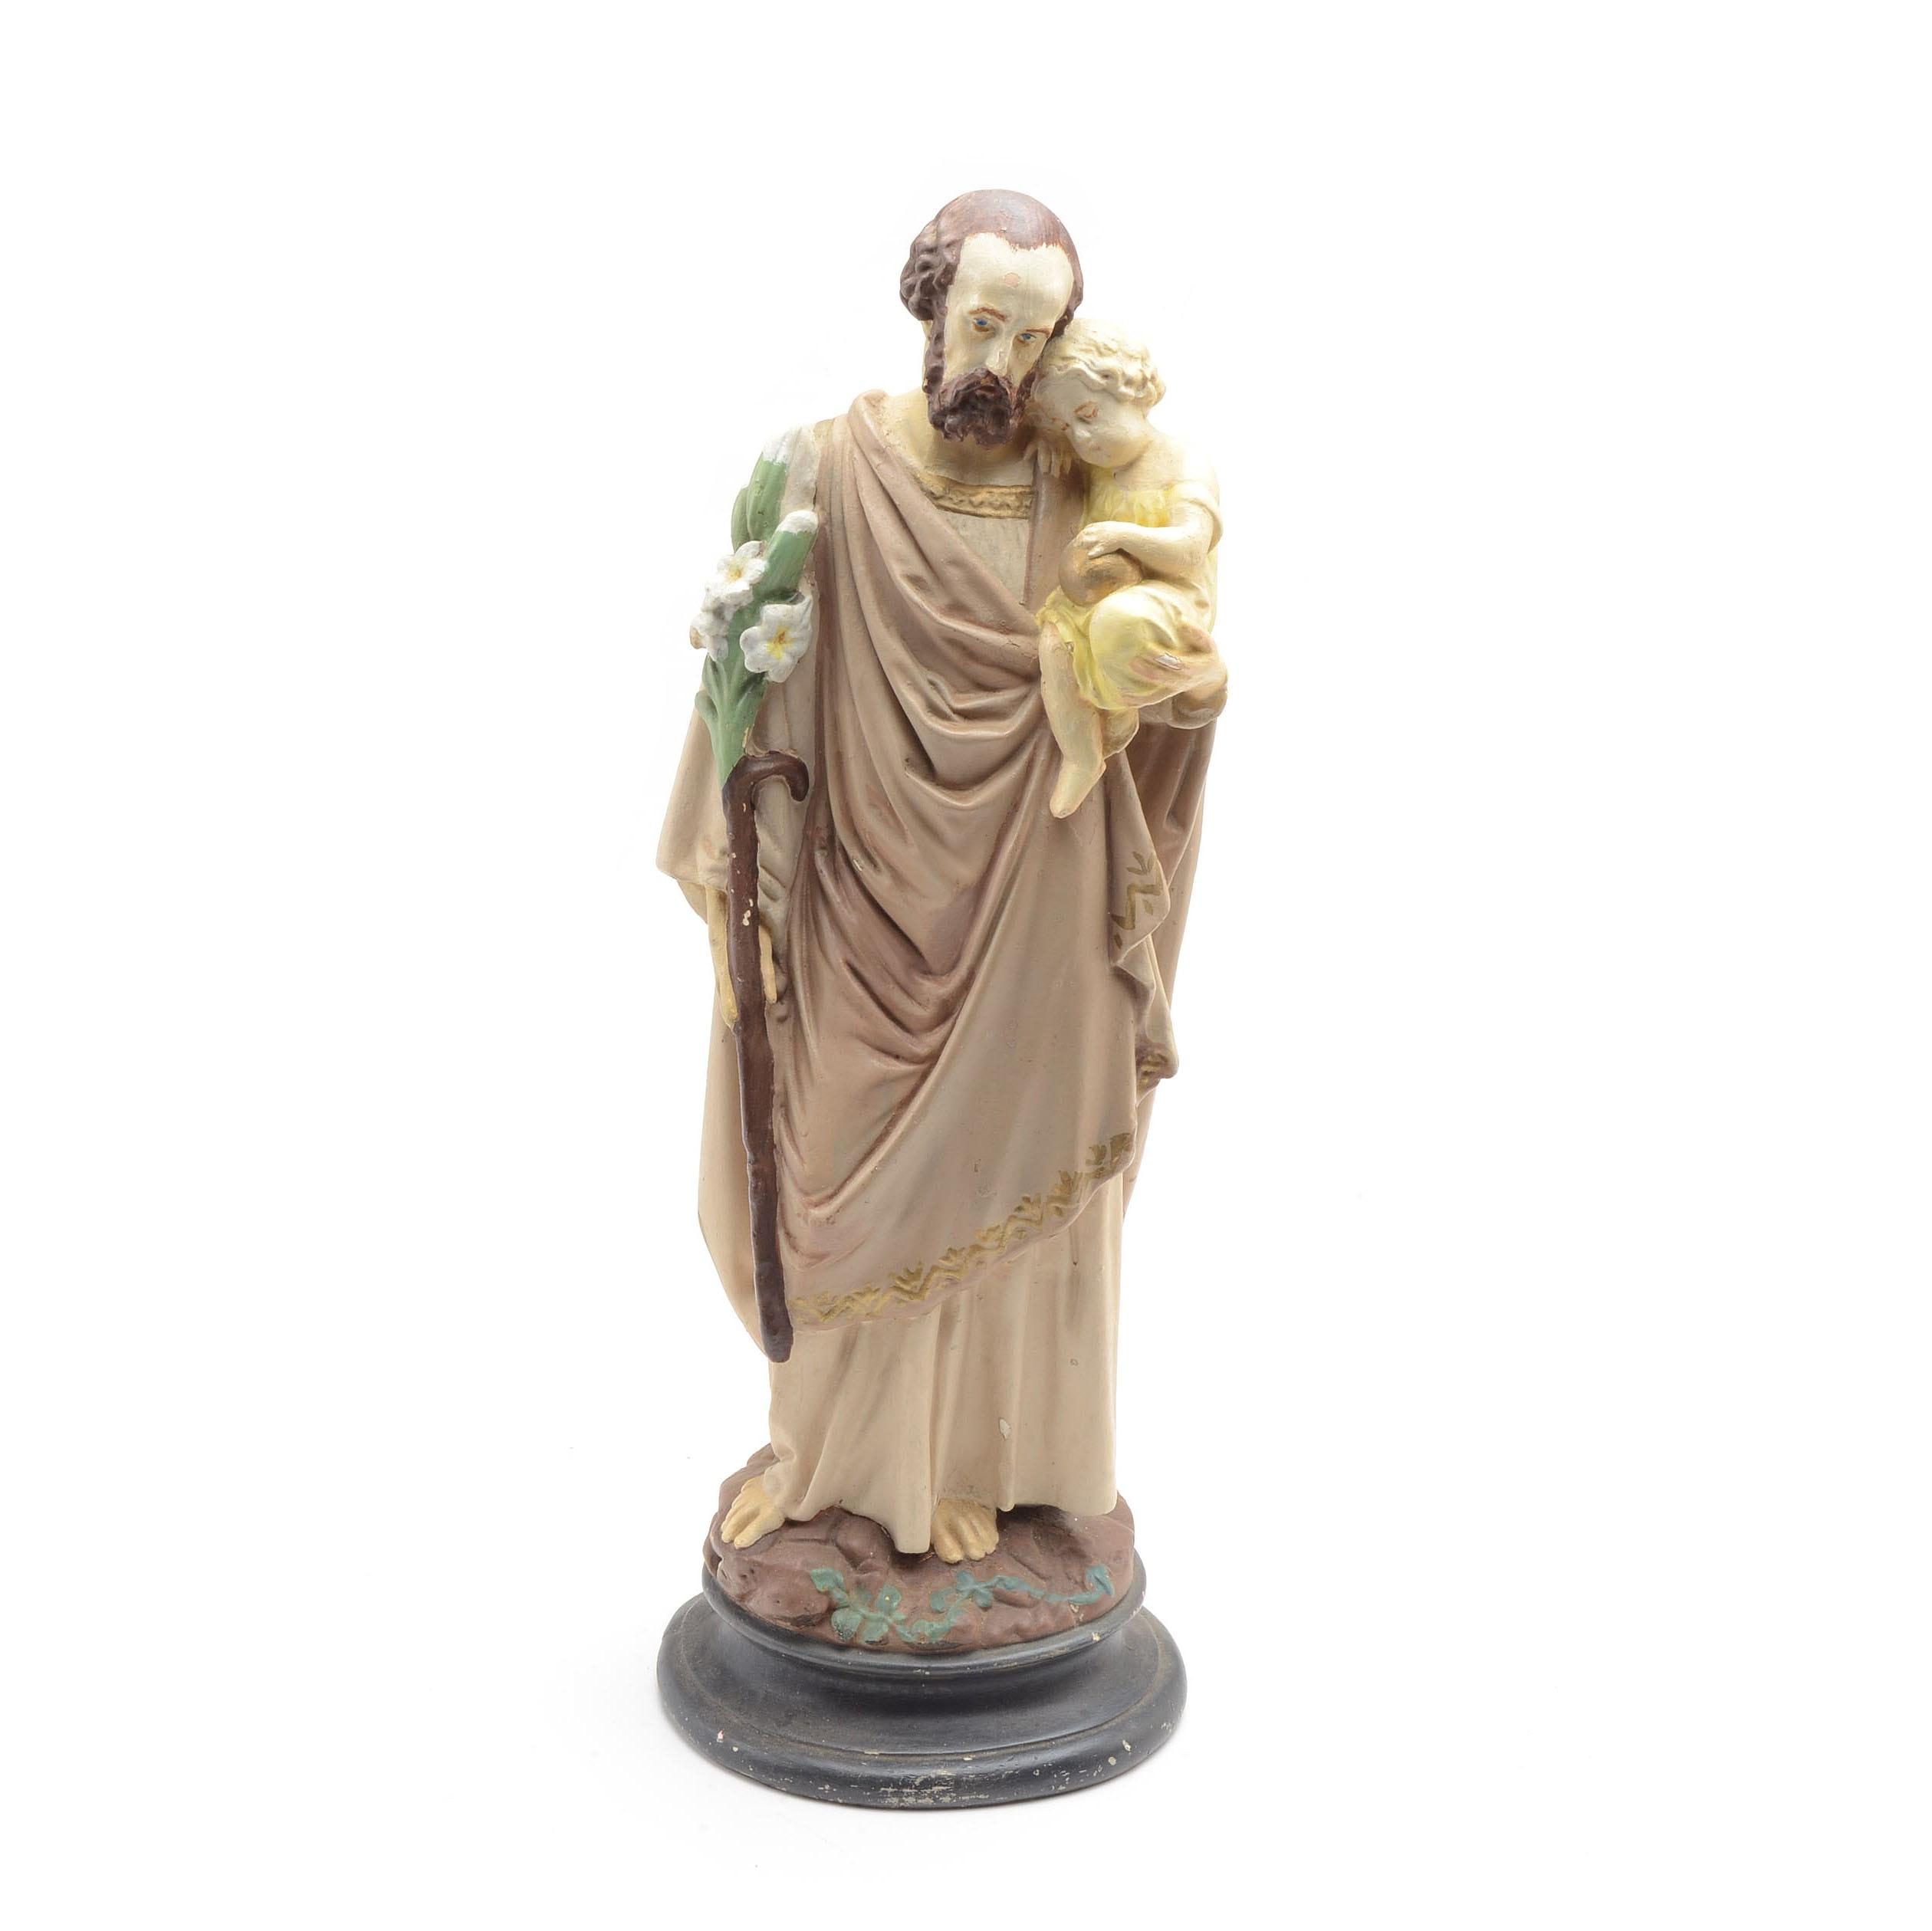 Vintage Figural Statue of Joseph